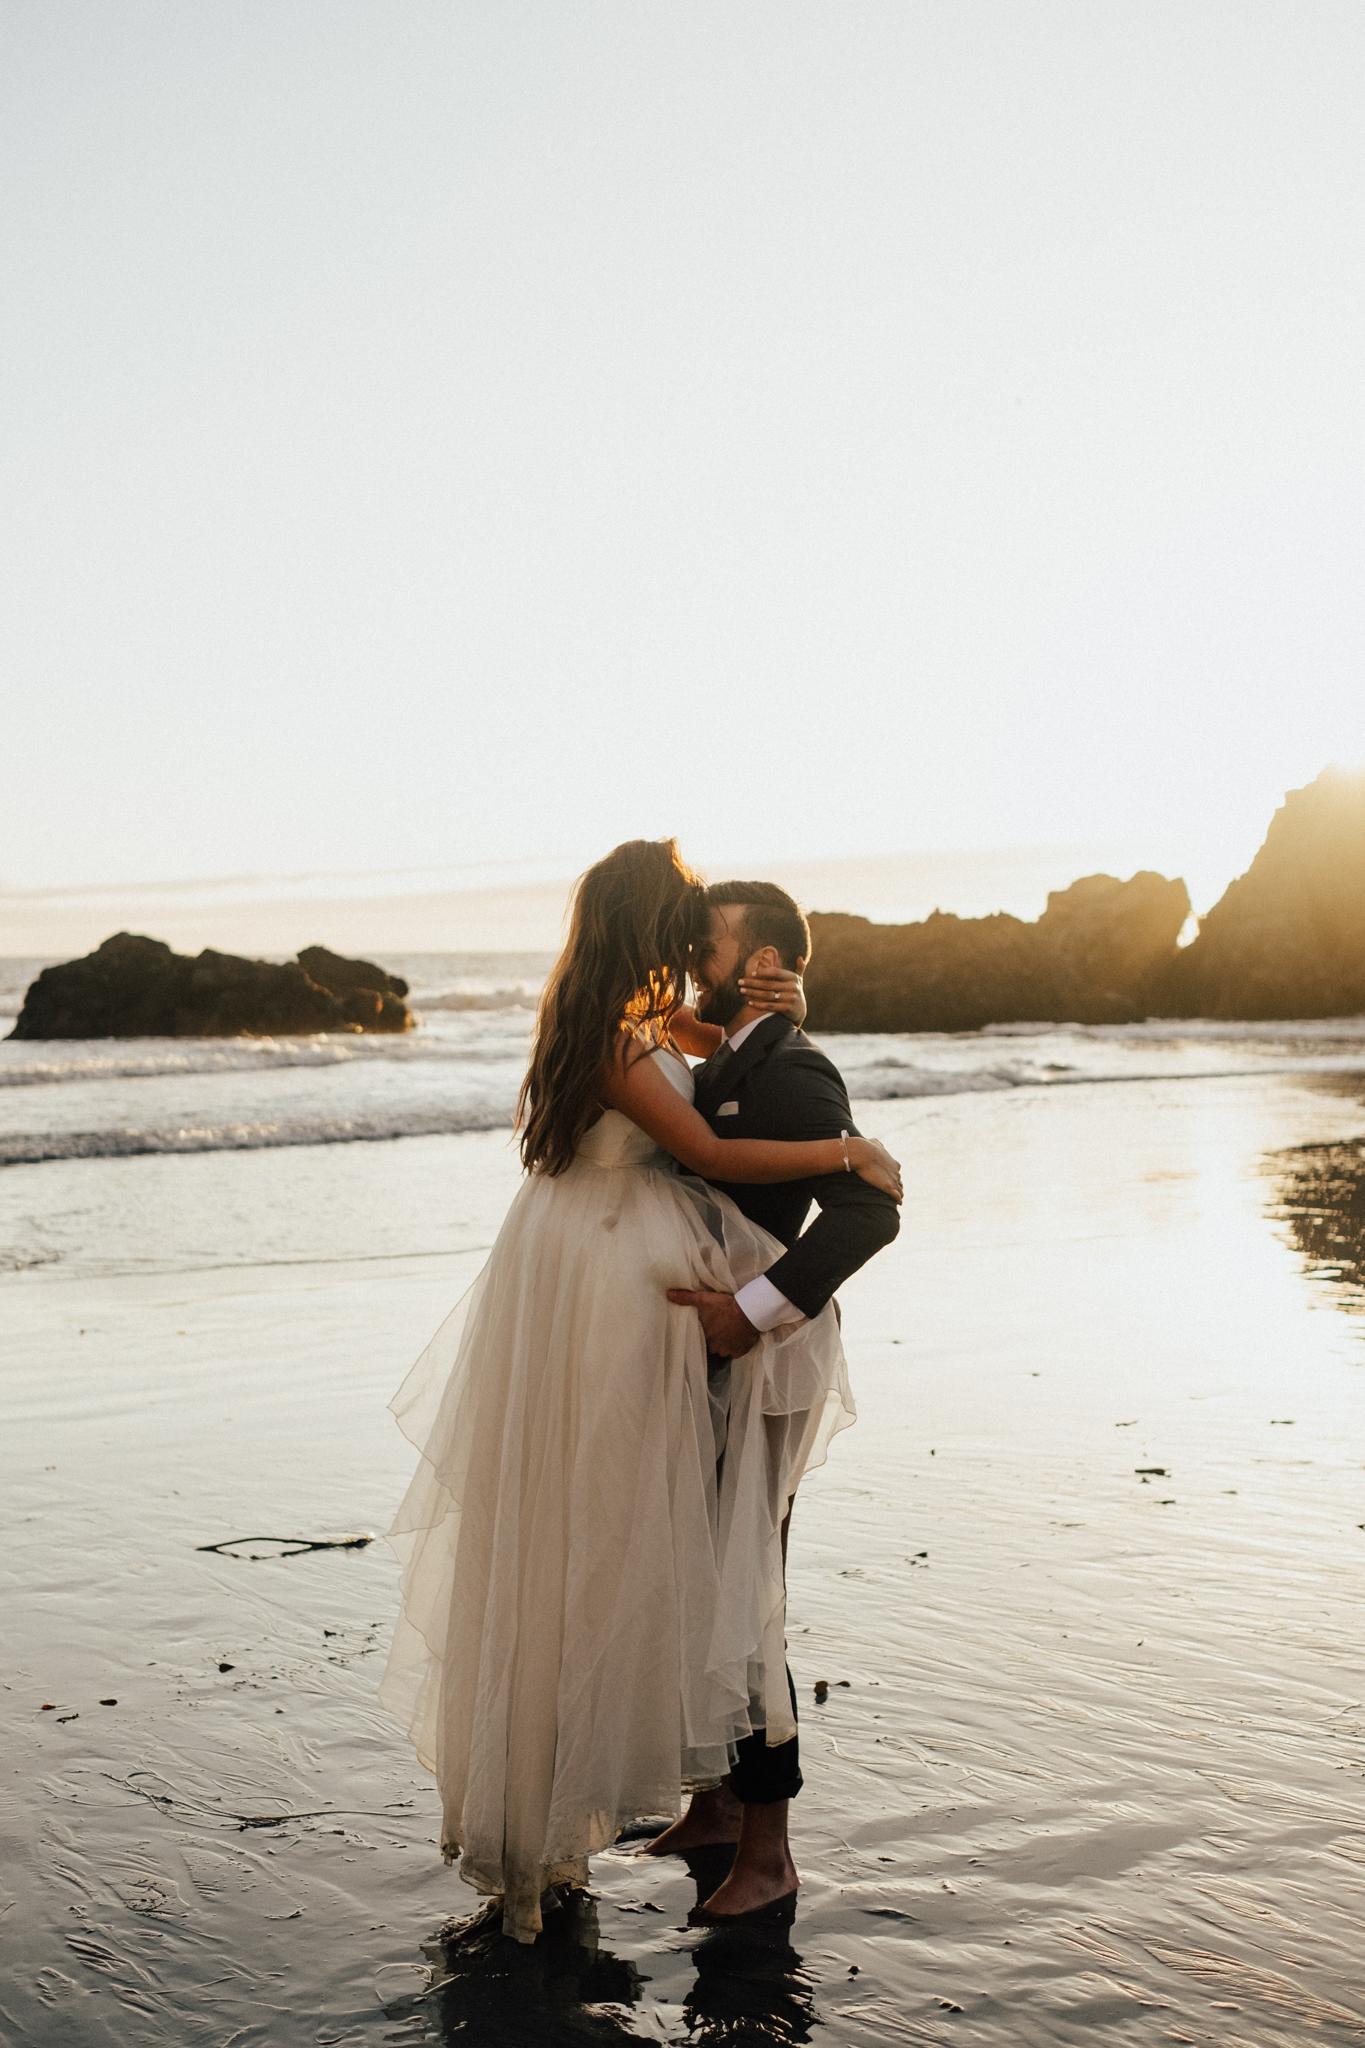 Arizona-Adventure-Elopement-Wedding-Photographer-137.jpg